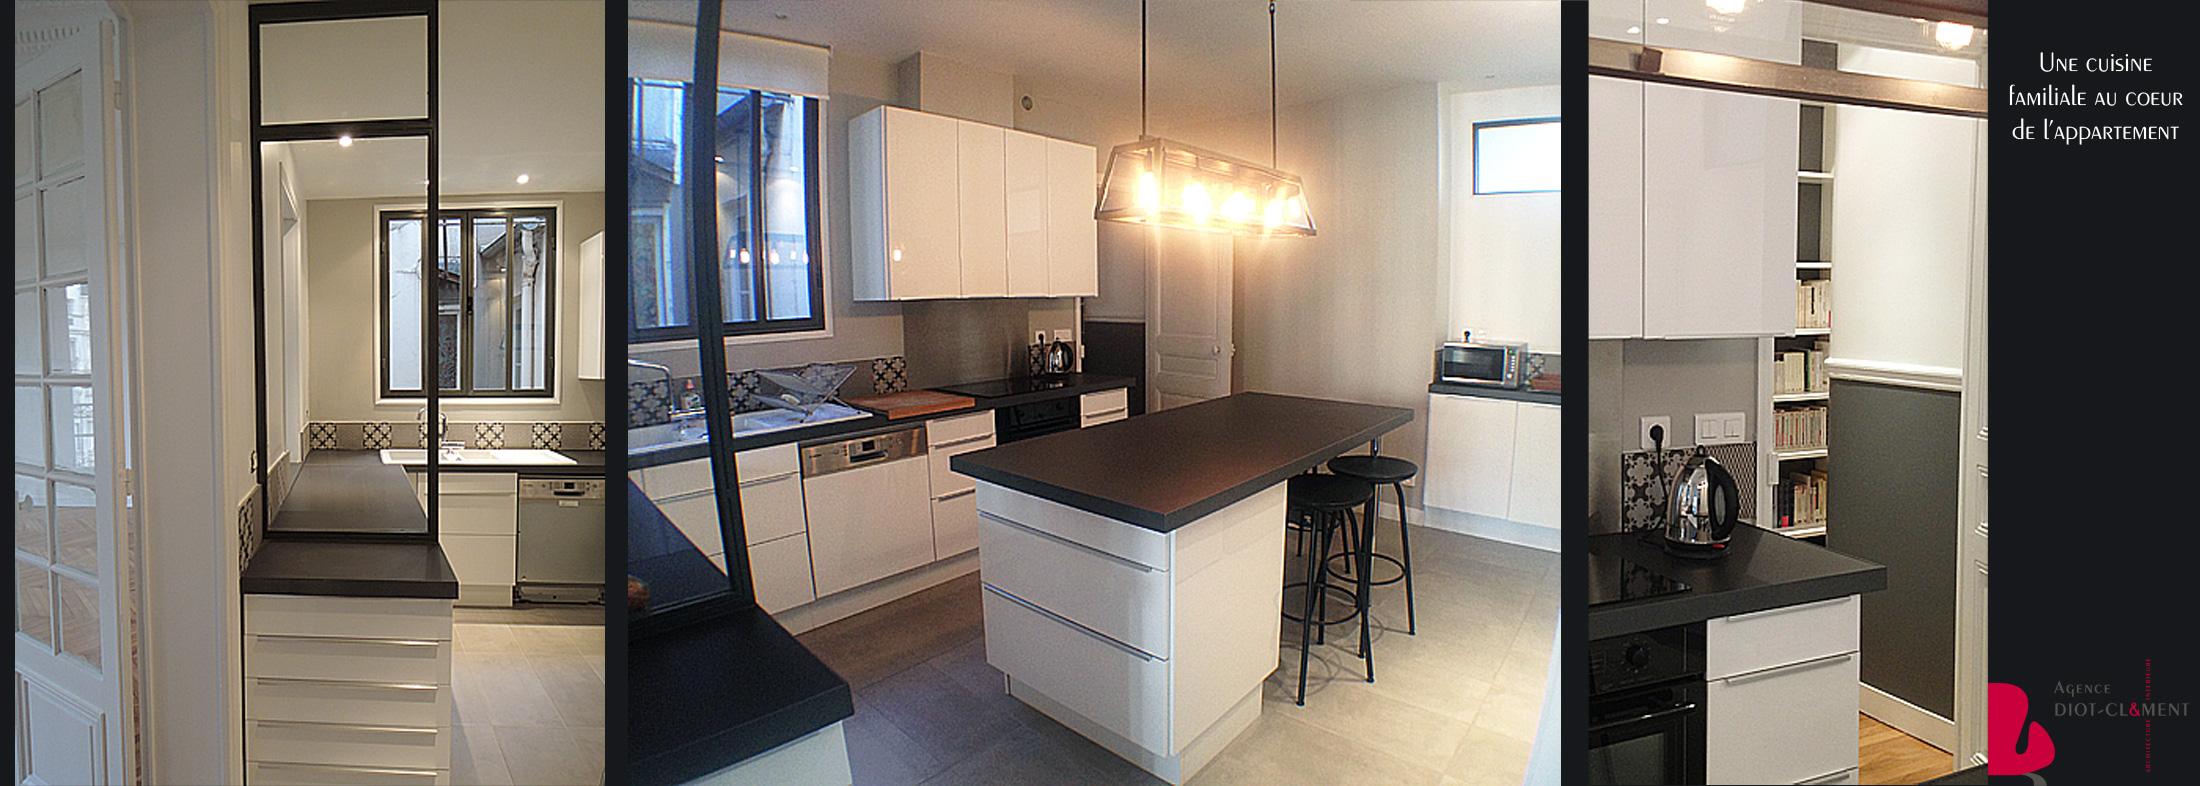 cuisine avec lot central portfolio tags agence diot clement. Black Bedroom Furniture Sets. Home Design Ideas